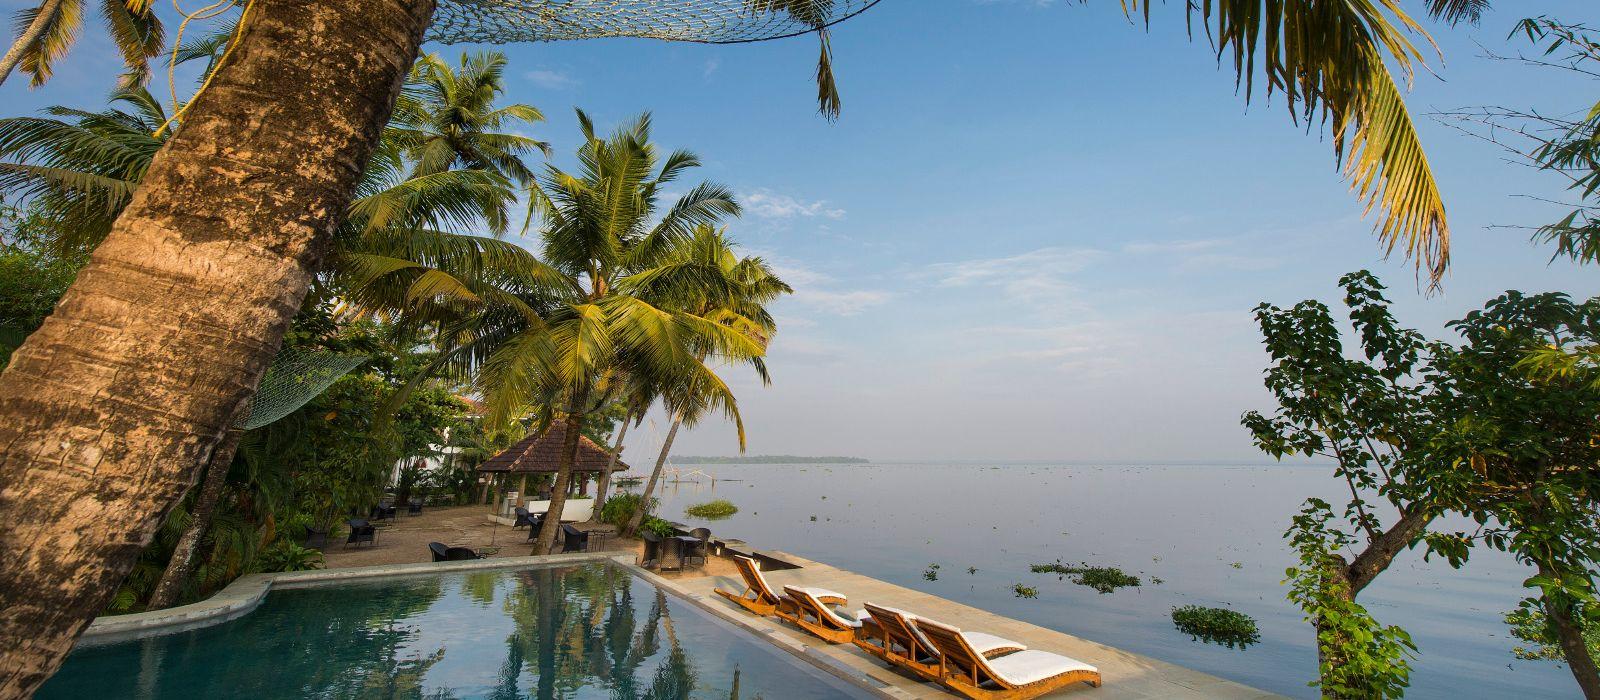 Hotel Malabar Escapes Purity Resort, Muhamma South India